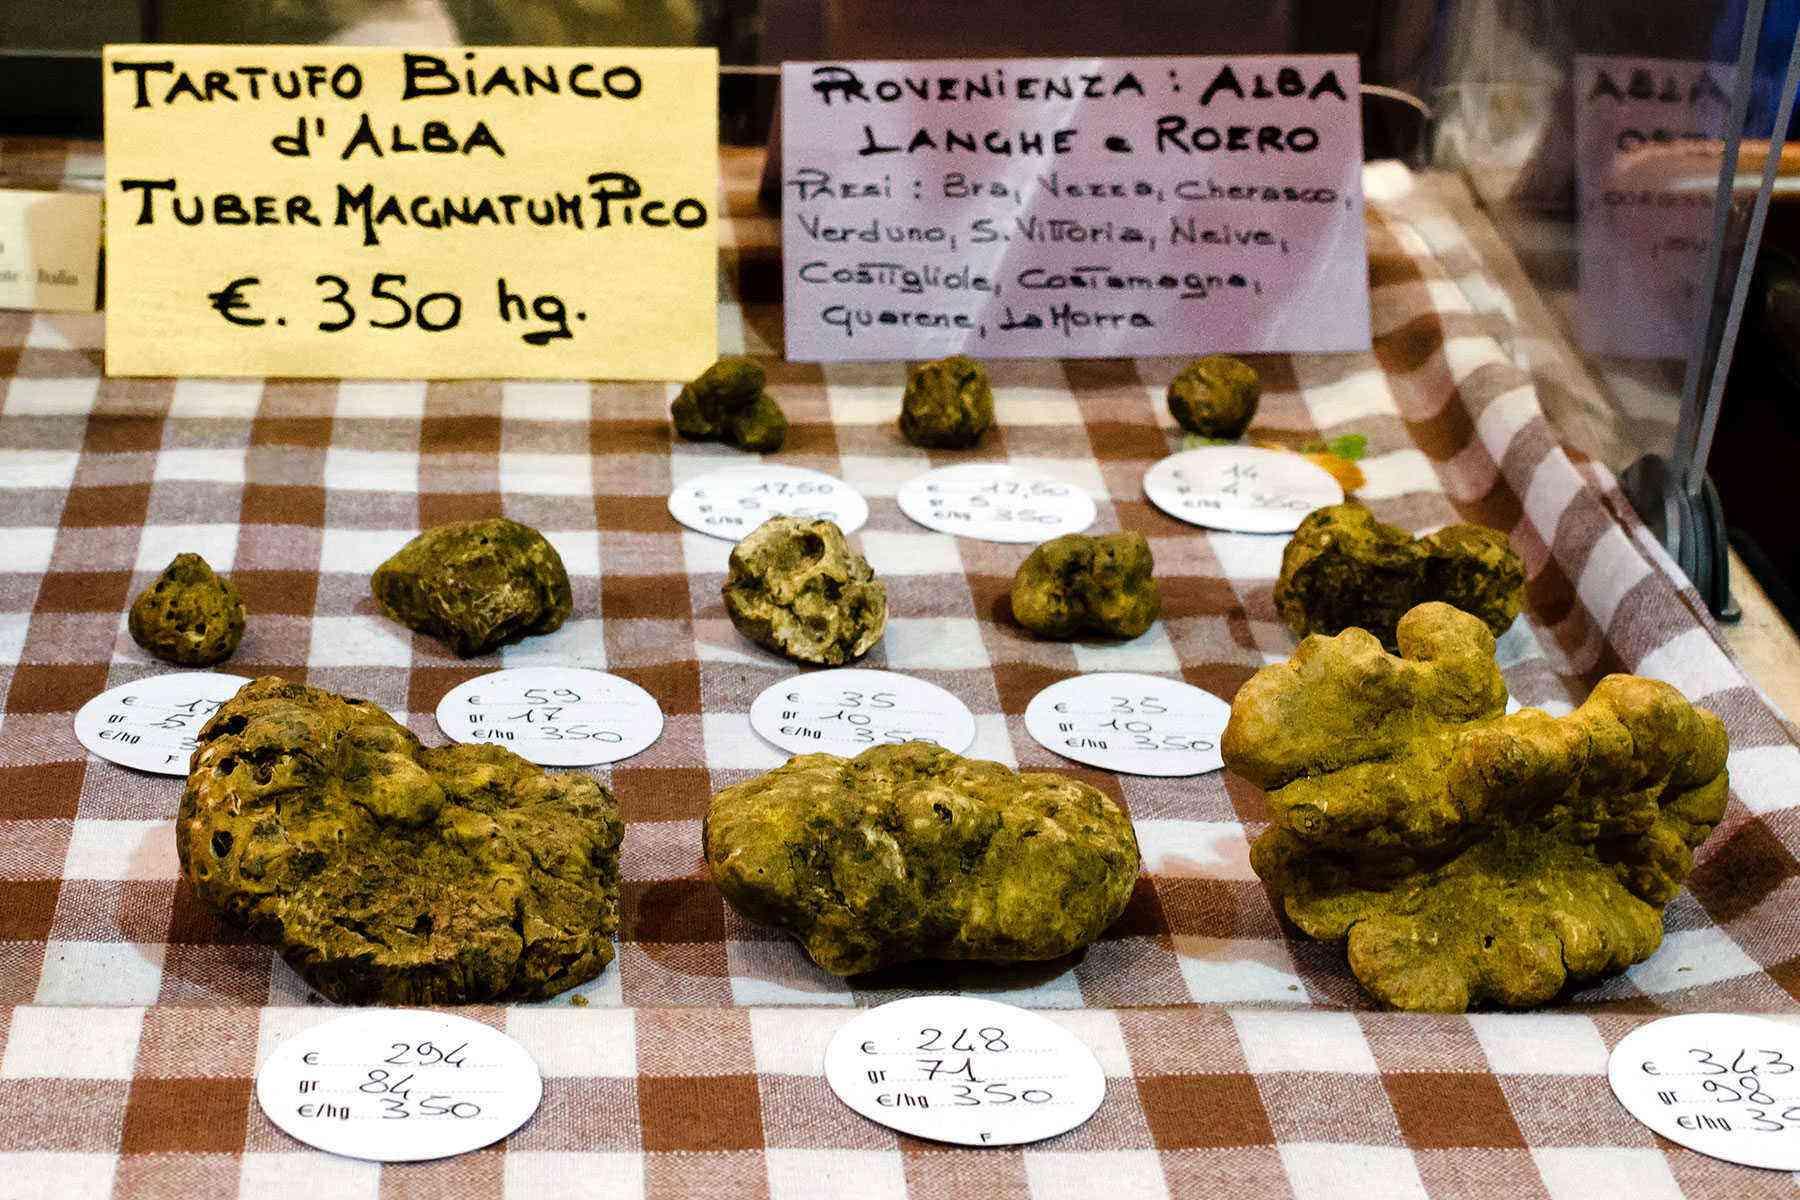 Fall-Food-Festivals-Alba-White-Truffle-Fair-2